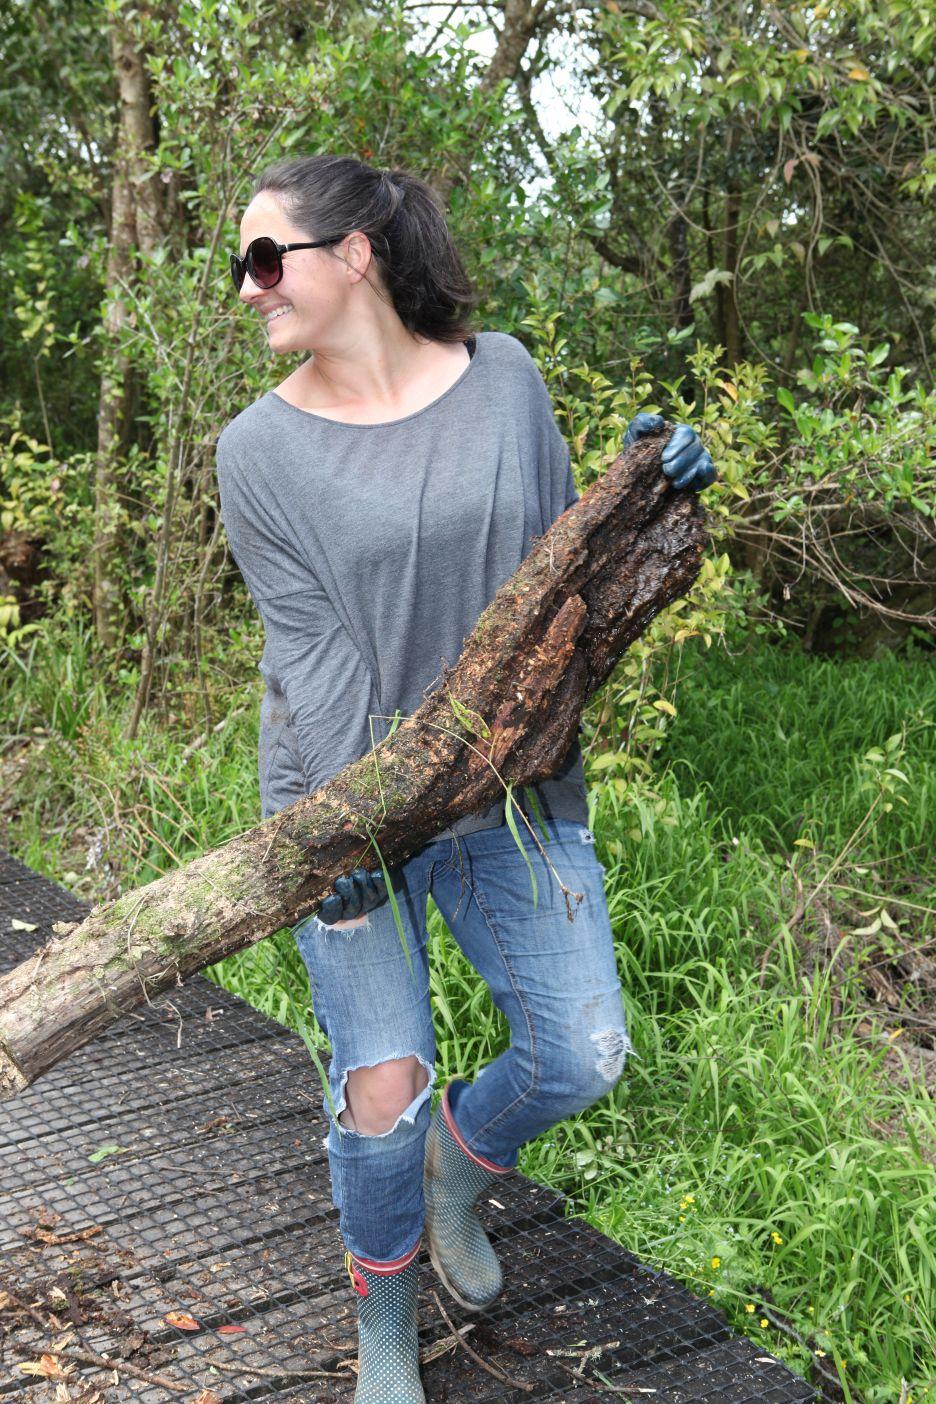 Act-of-Kindness-Volunteer-Waikato-River-Trails-IMG_0593.JPG